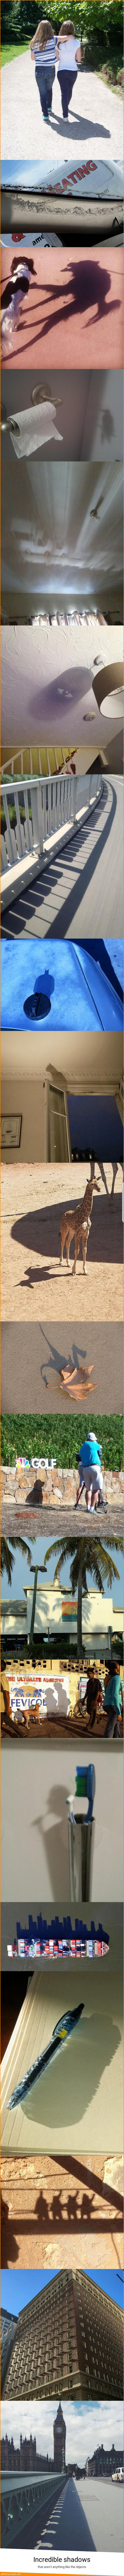 Incredible shadows